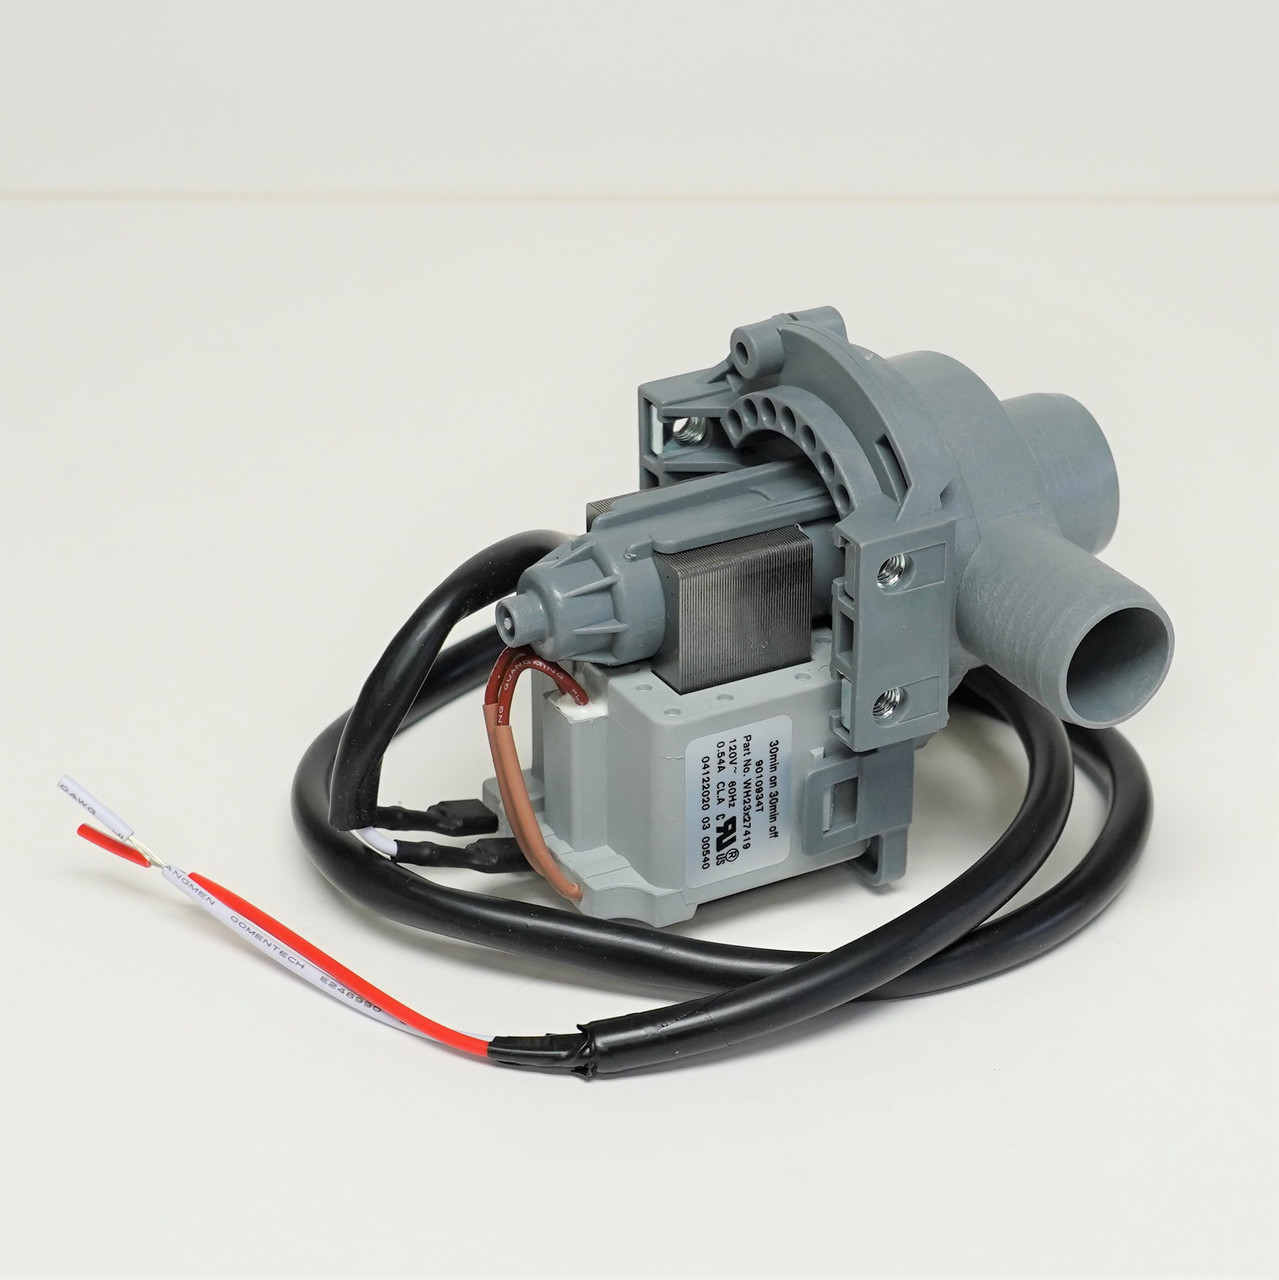 Washing Machine Drain Pump for GE   McCombs Supply Co   WH23X27419   Ge Washing Machine Pump Wiring      McCombs Supply